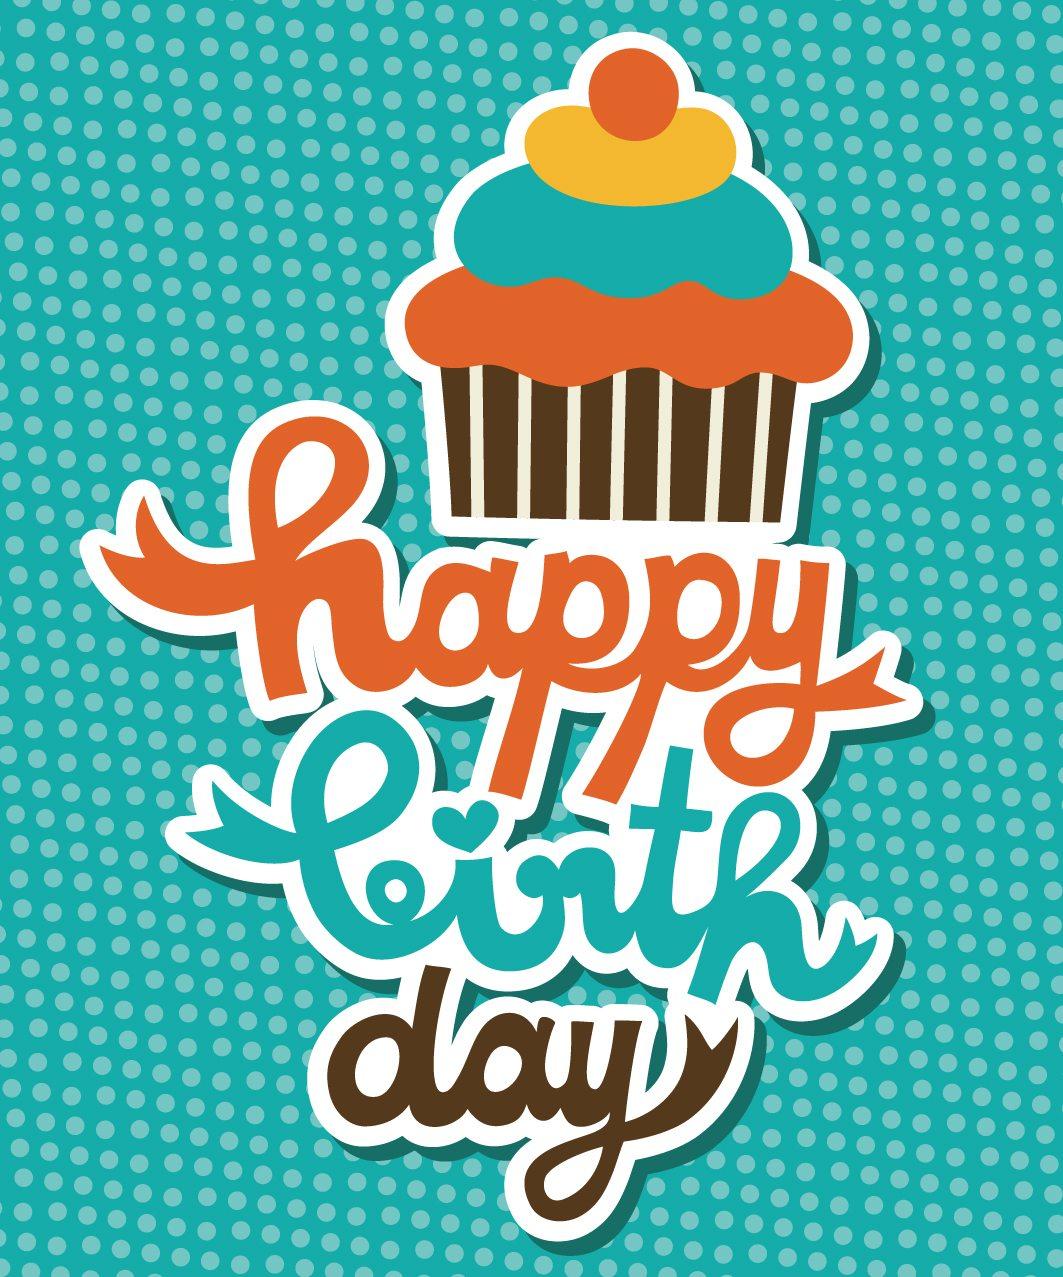 Happy-Birthday-monbibi-Shutterstock.com